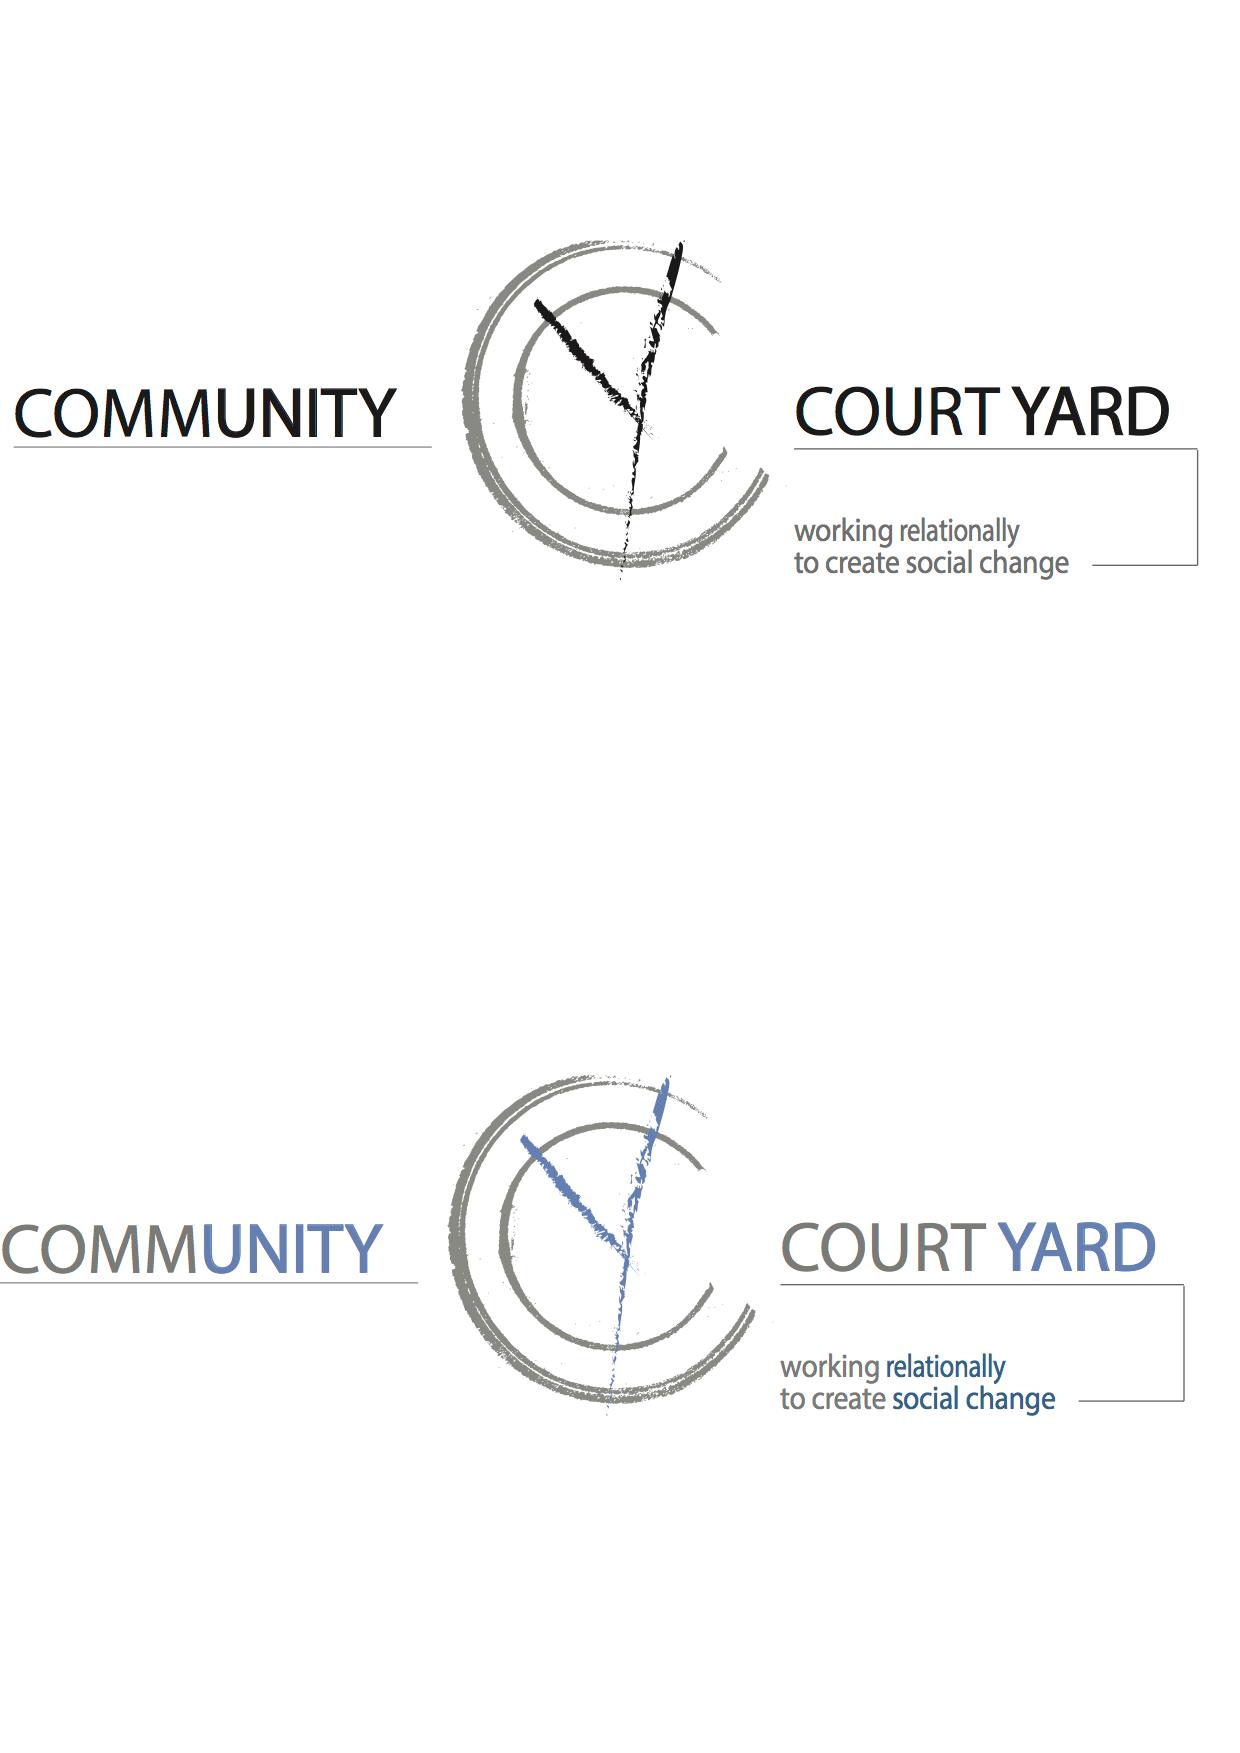 Community Court Yard